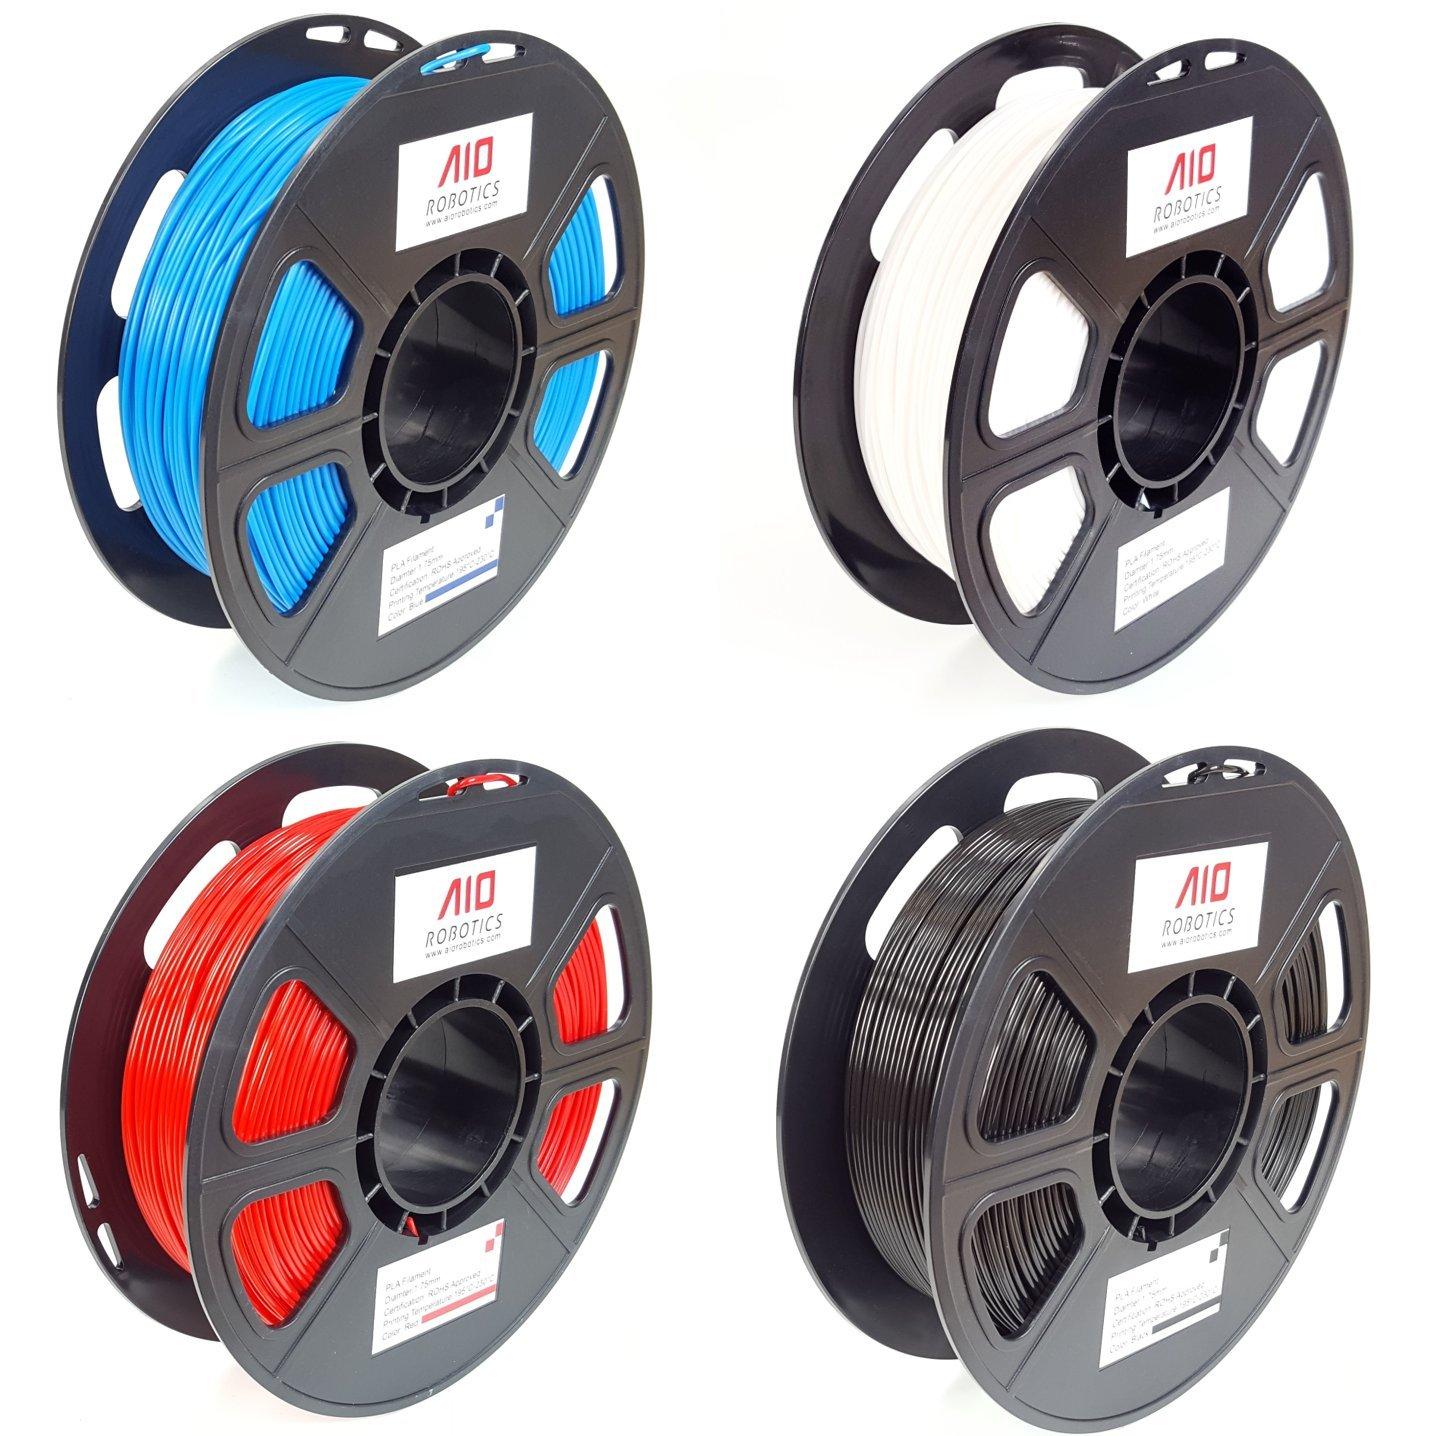 Blanco PLA 4 x 0,5 kg PLA Filamento AIO Robotics Premium para impresoras 3D 9010RL 206C 426C 285C colores populares Azul Rojo Negro